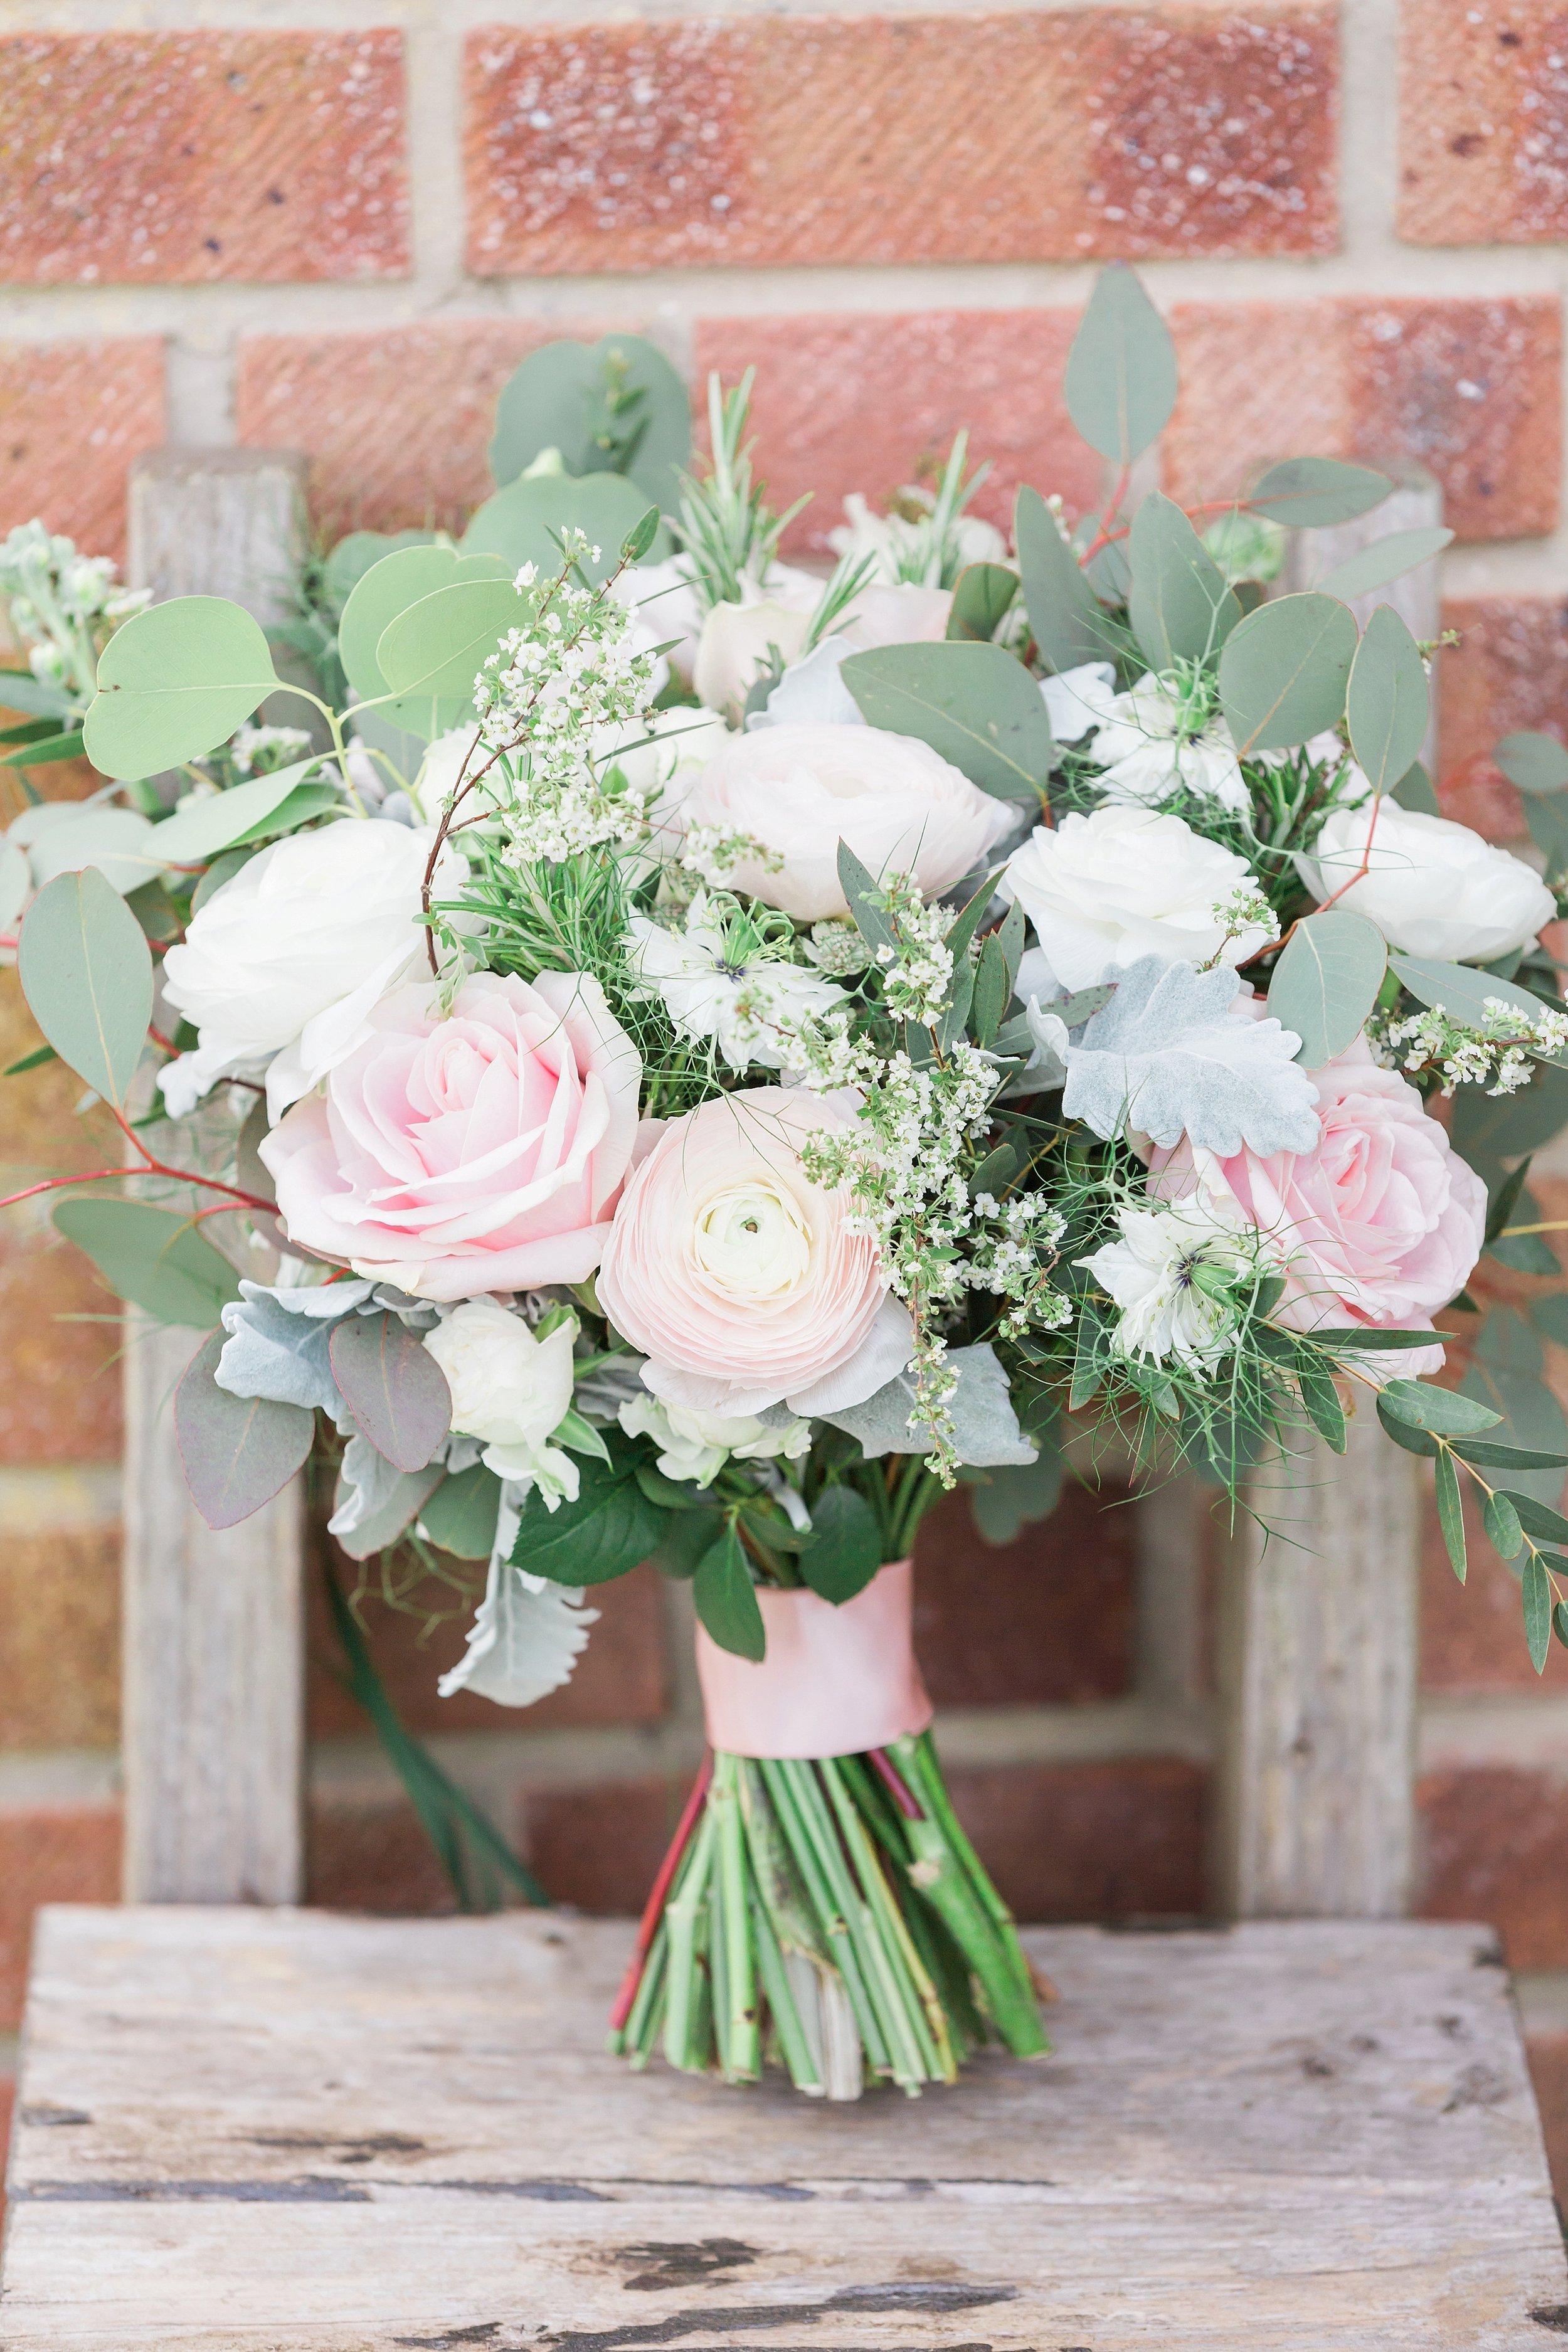 blush and green wedding bouquet.jpg